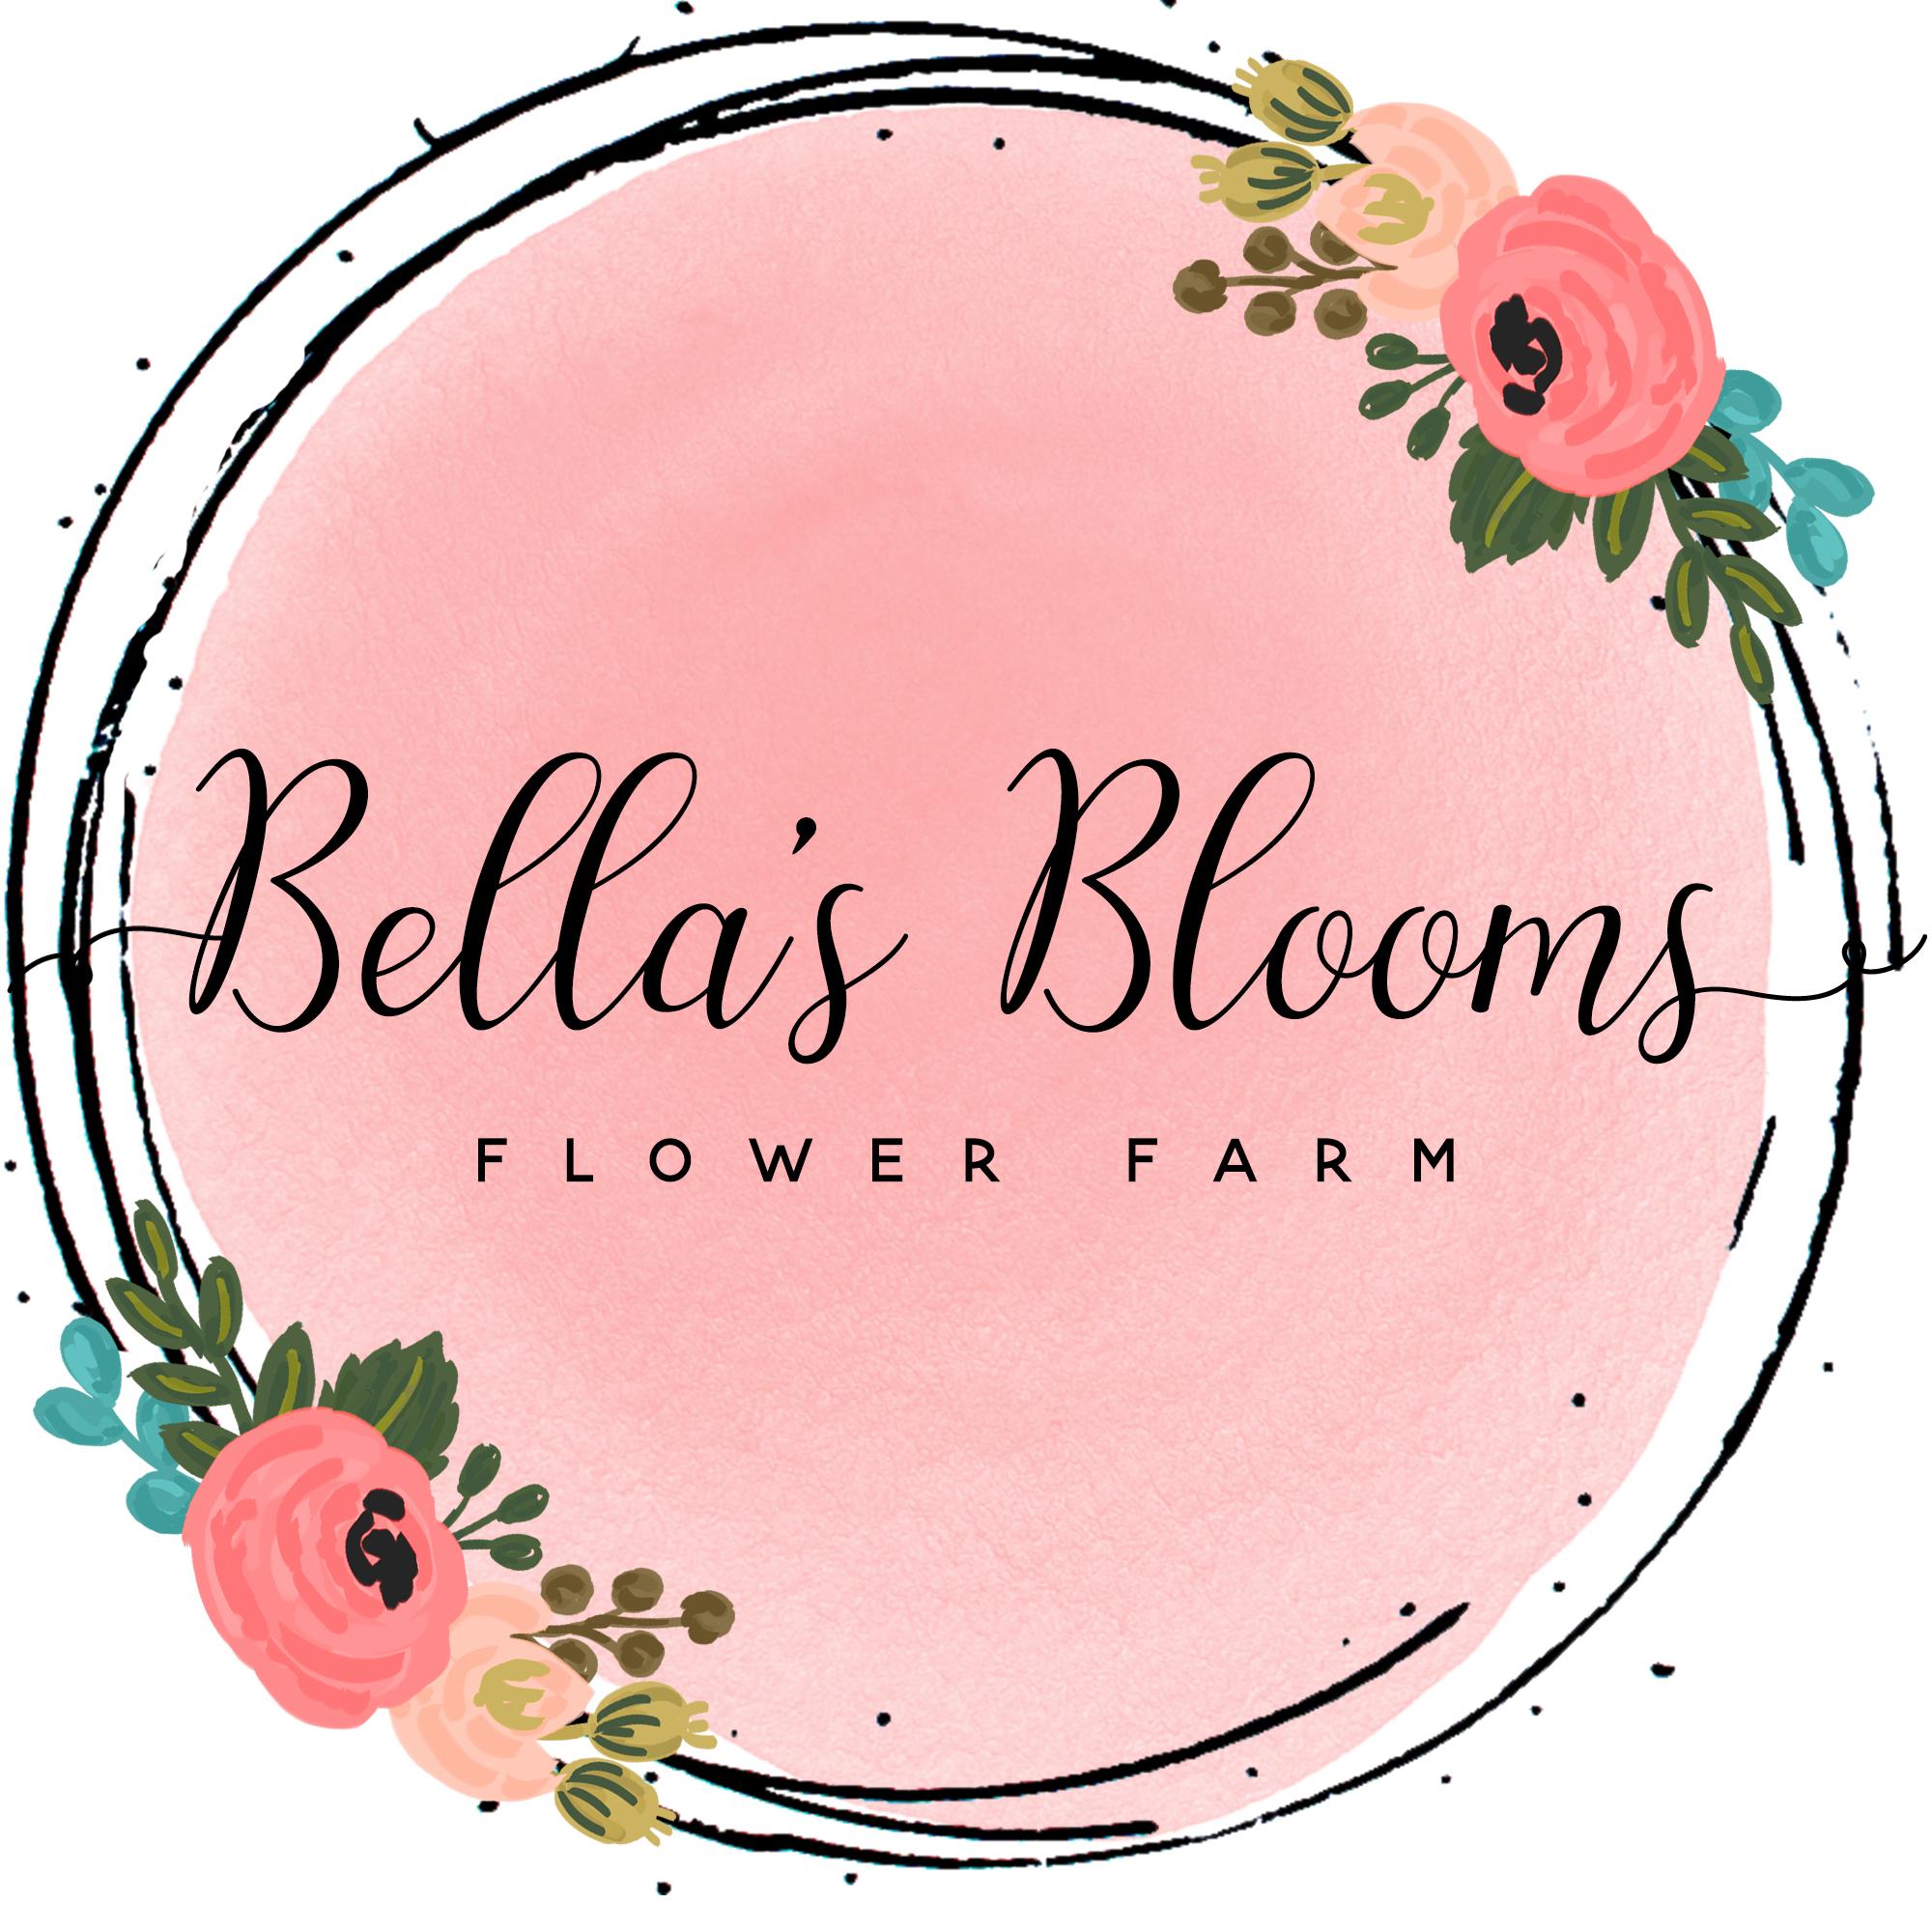 Bella's Blooms Logo for banner.jpg